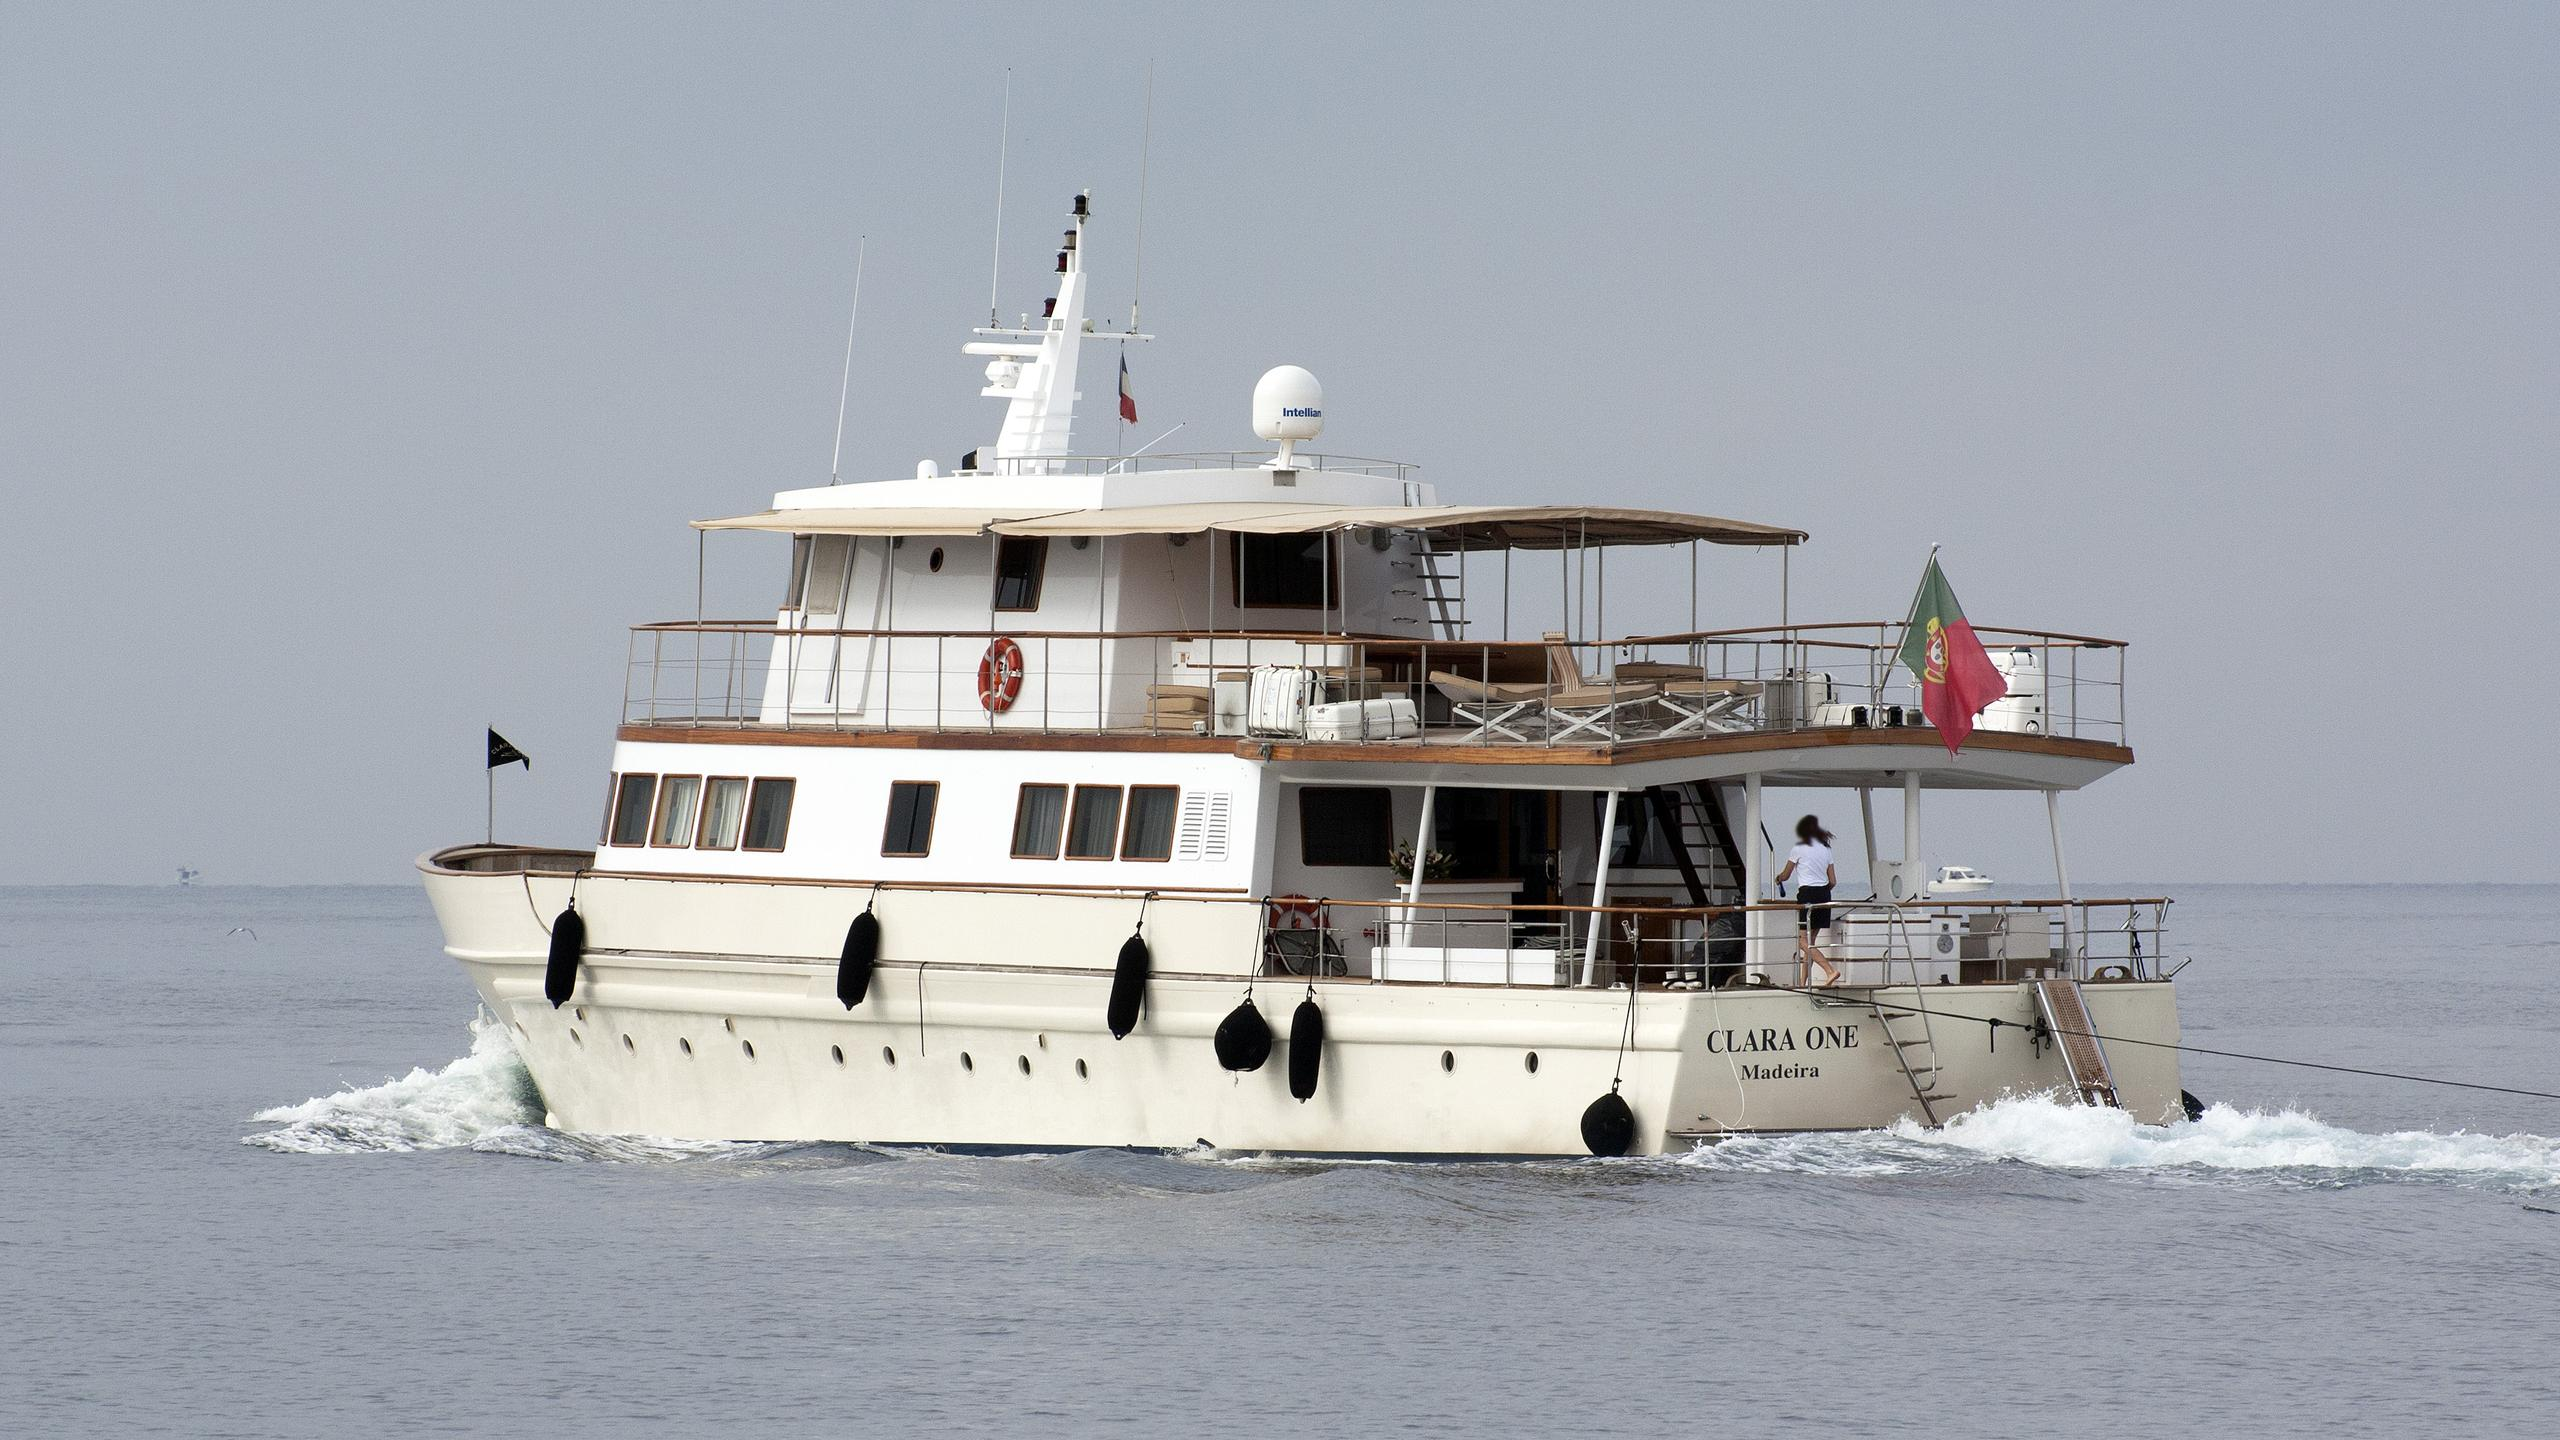 clara-one-motor-yacht-sarri-1961-31m-half-profile